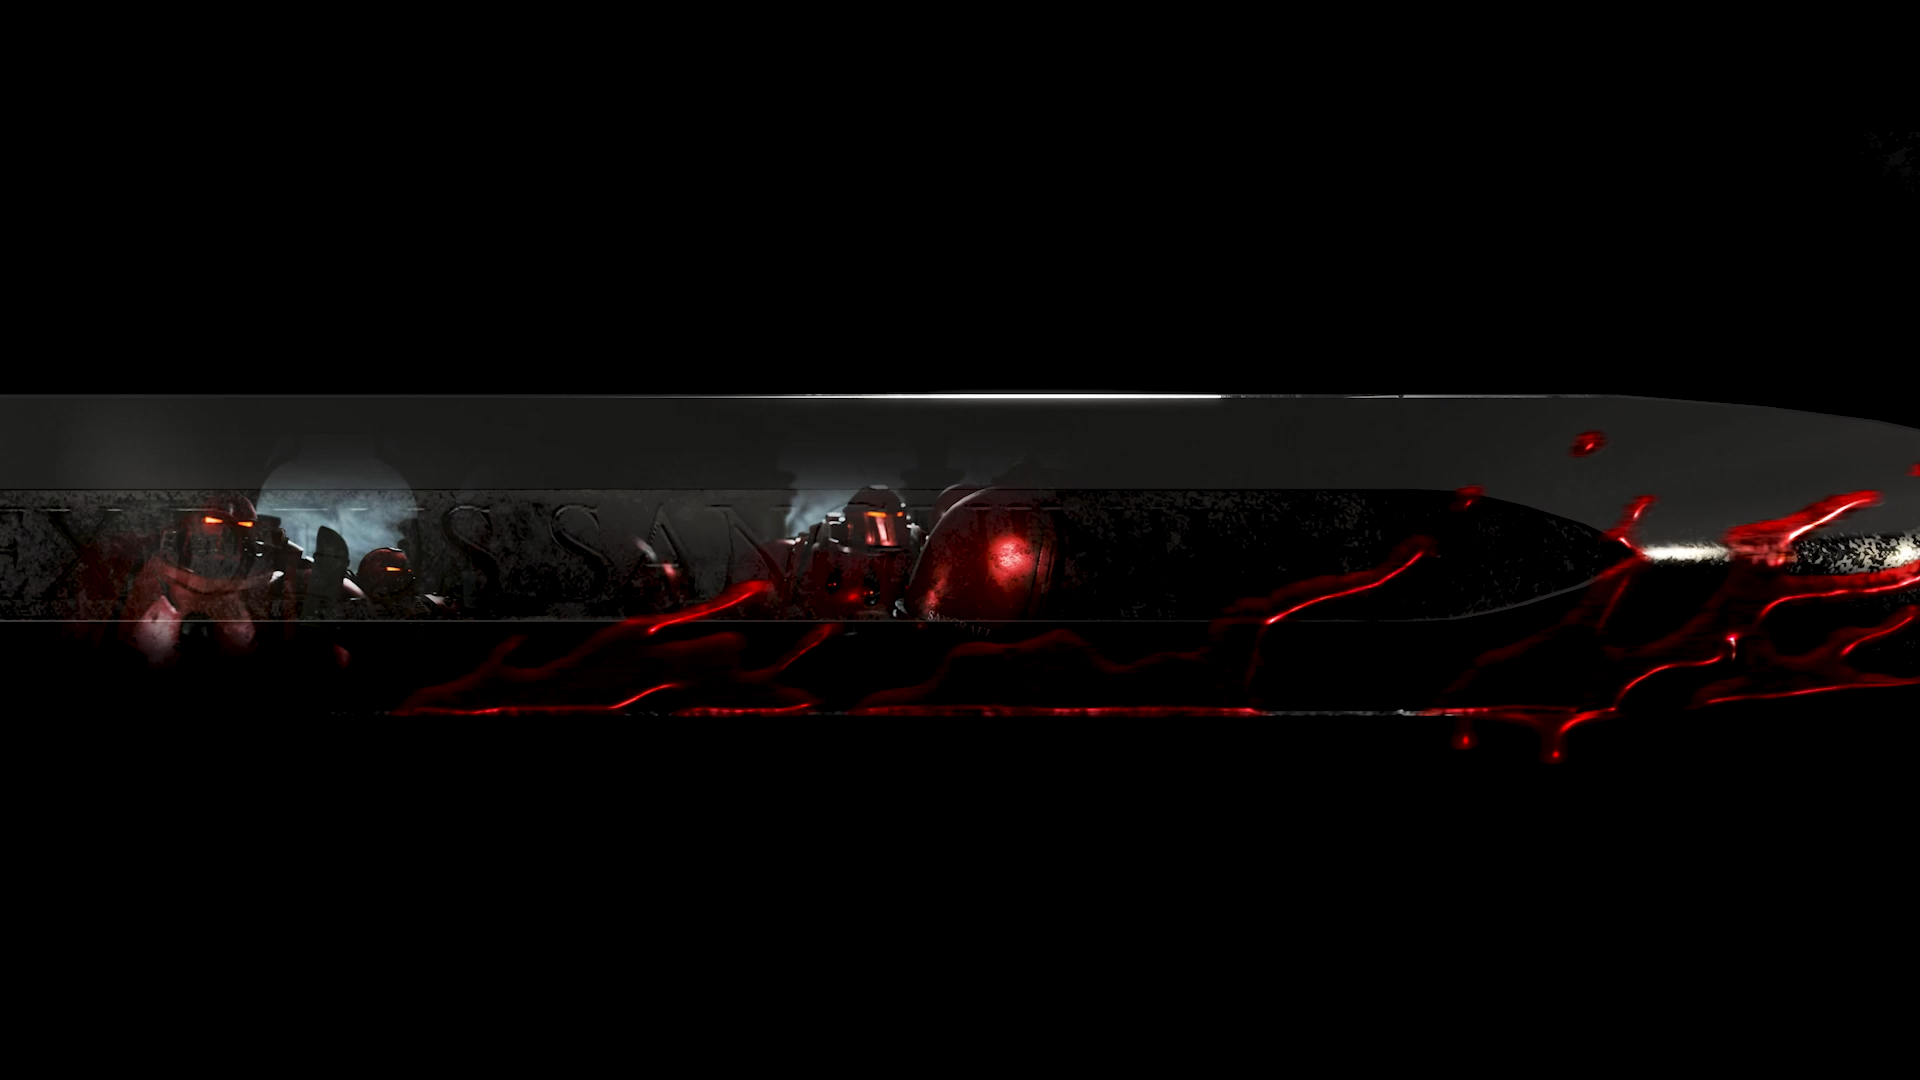 Angels of Death - 01 (WEBRip 1920x1080 x264 AAC Rus + Eng).mkv_snapshot_01.53_[2021.08.28_16.38.11].png